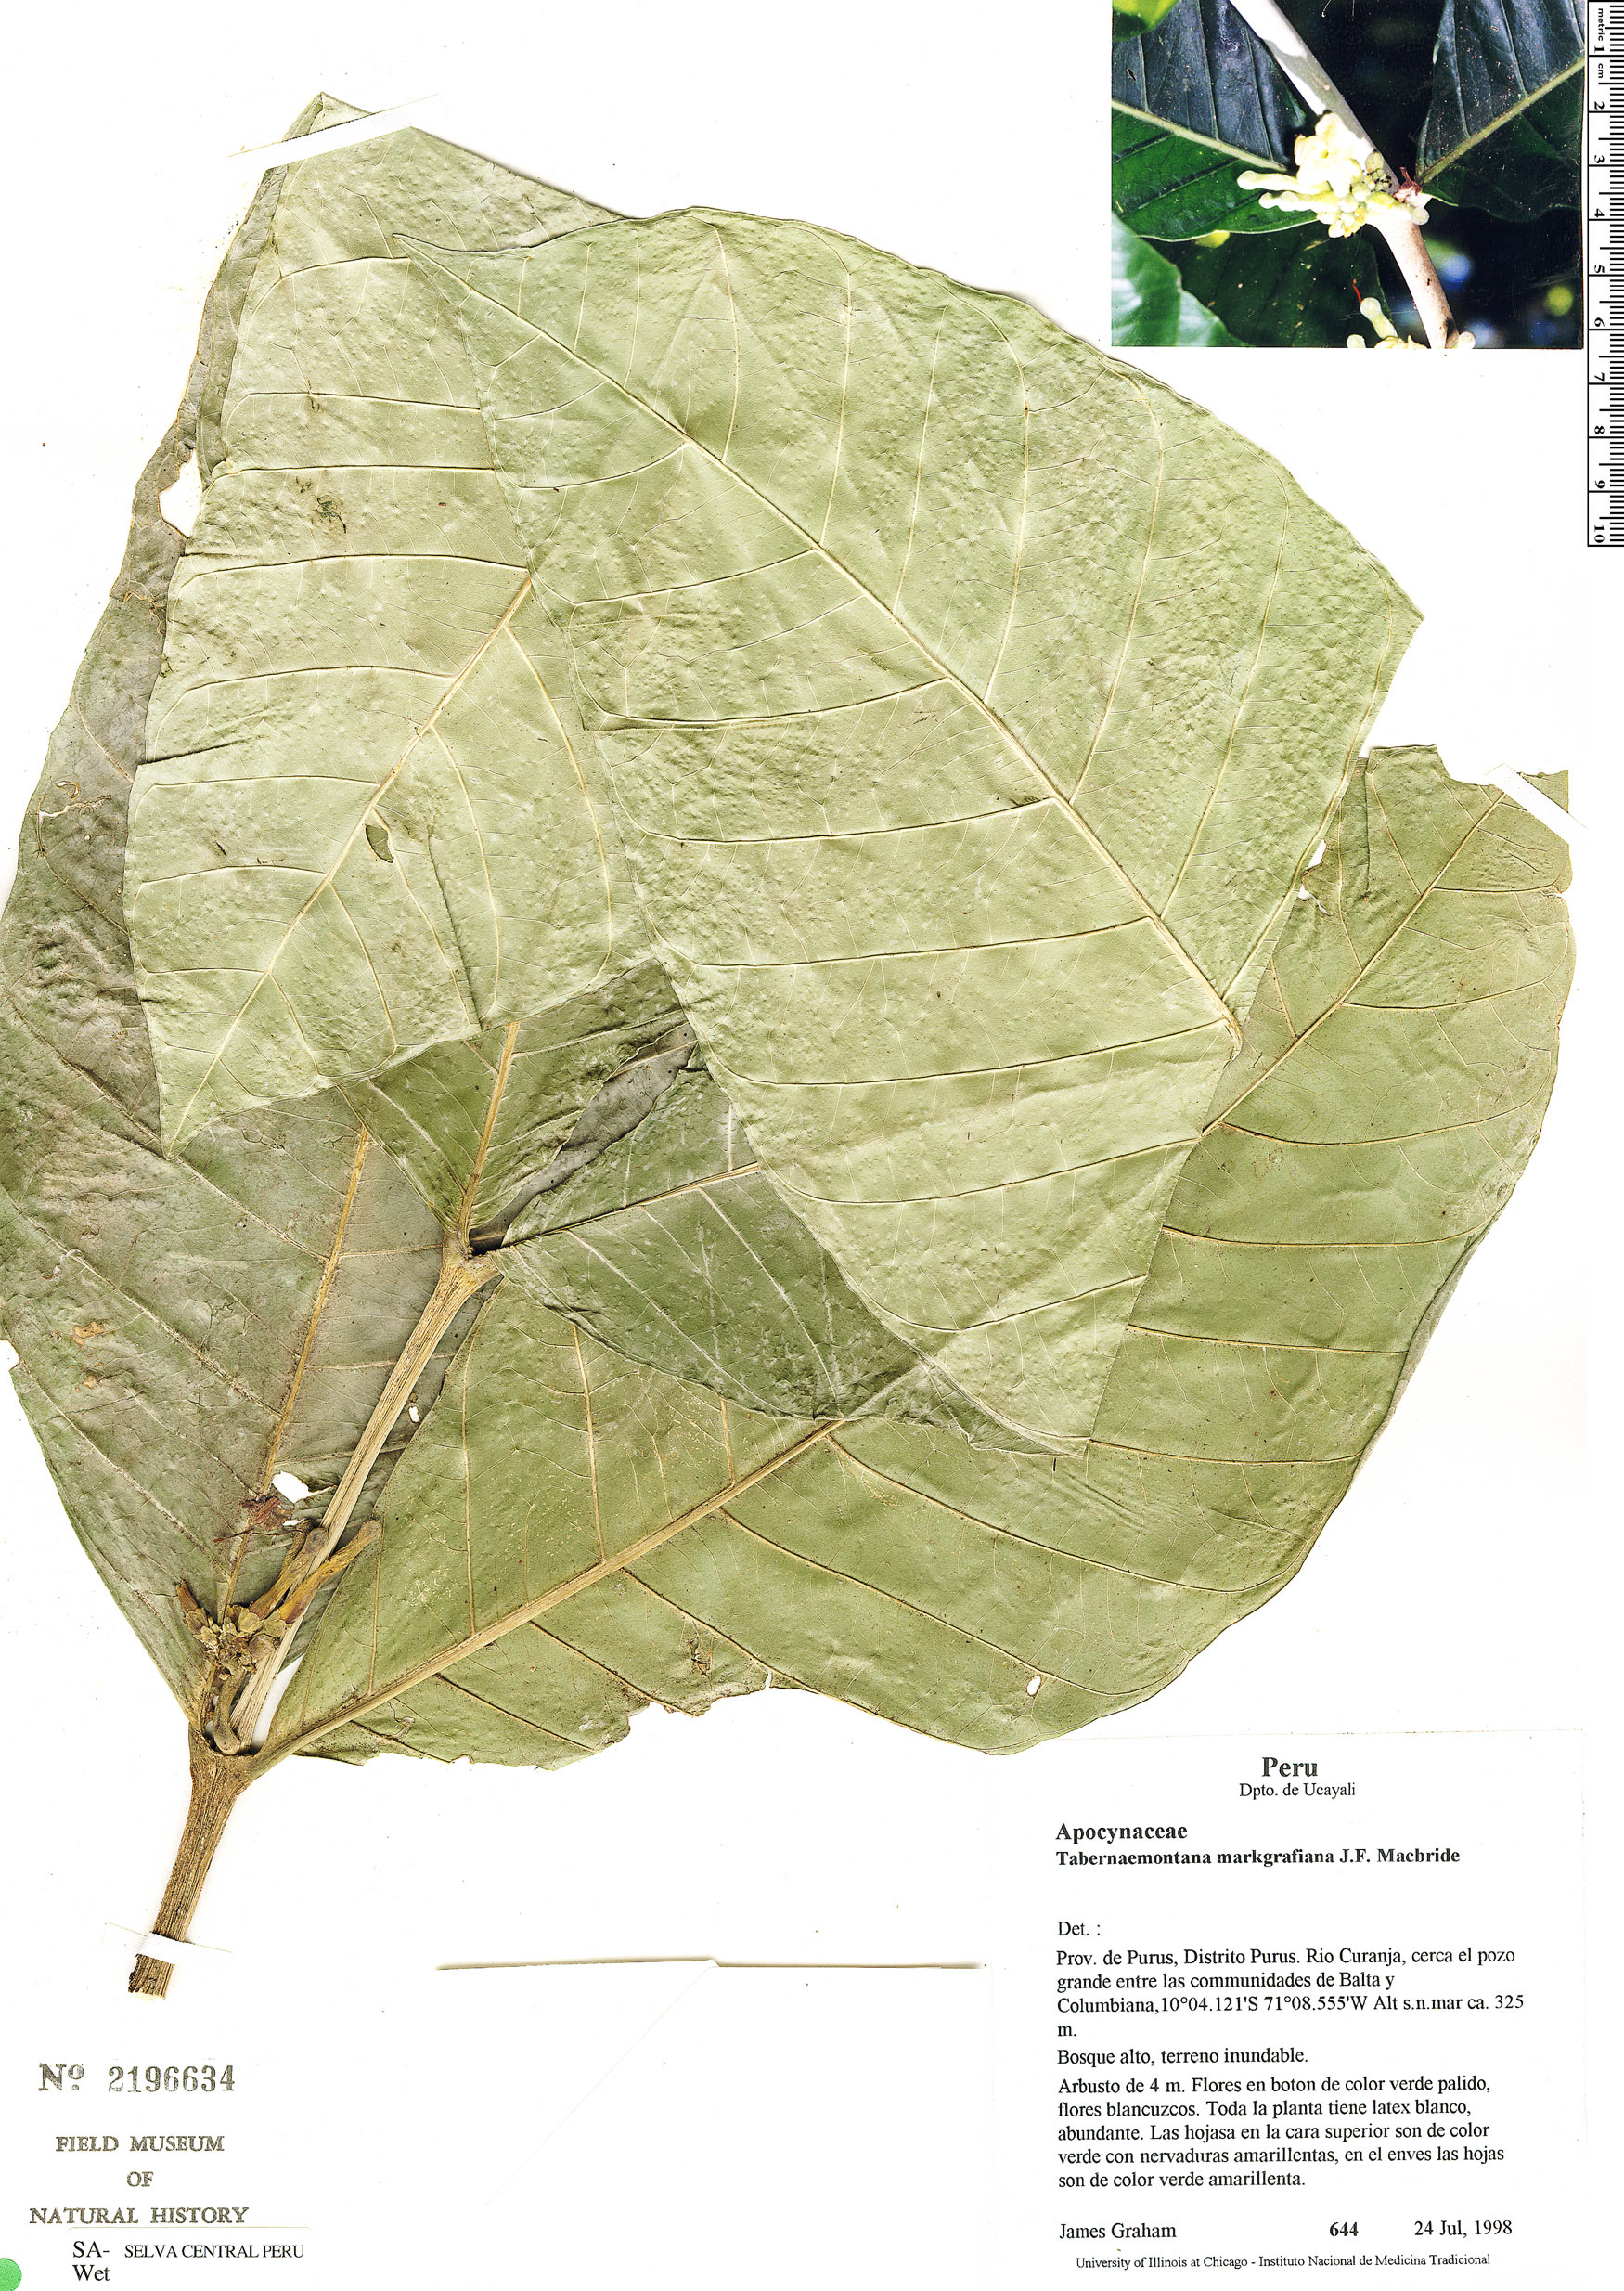 Specimen: Tabernaemontana markgrafiana